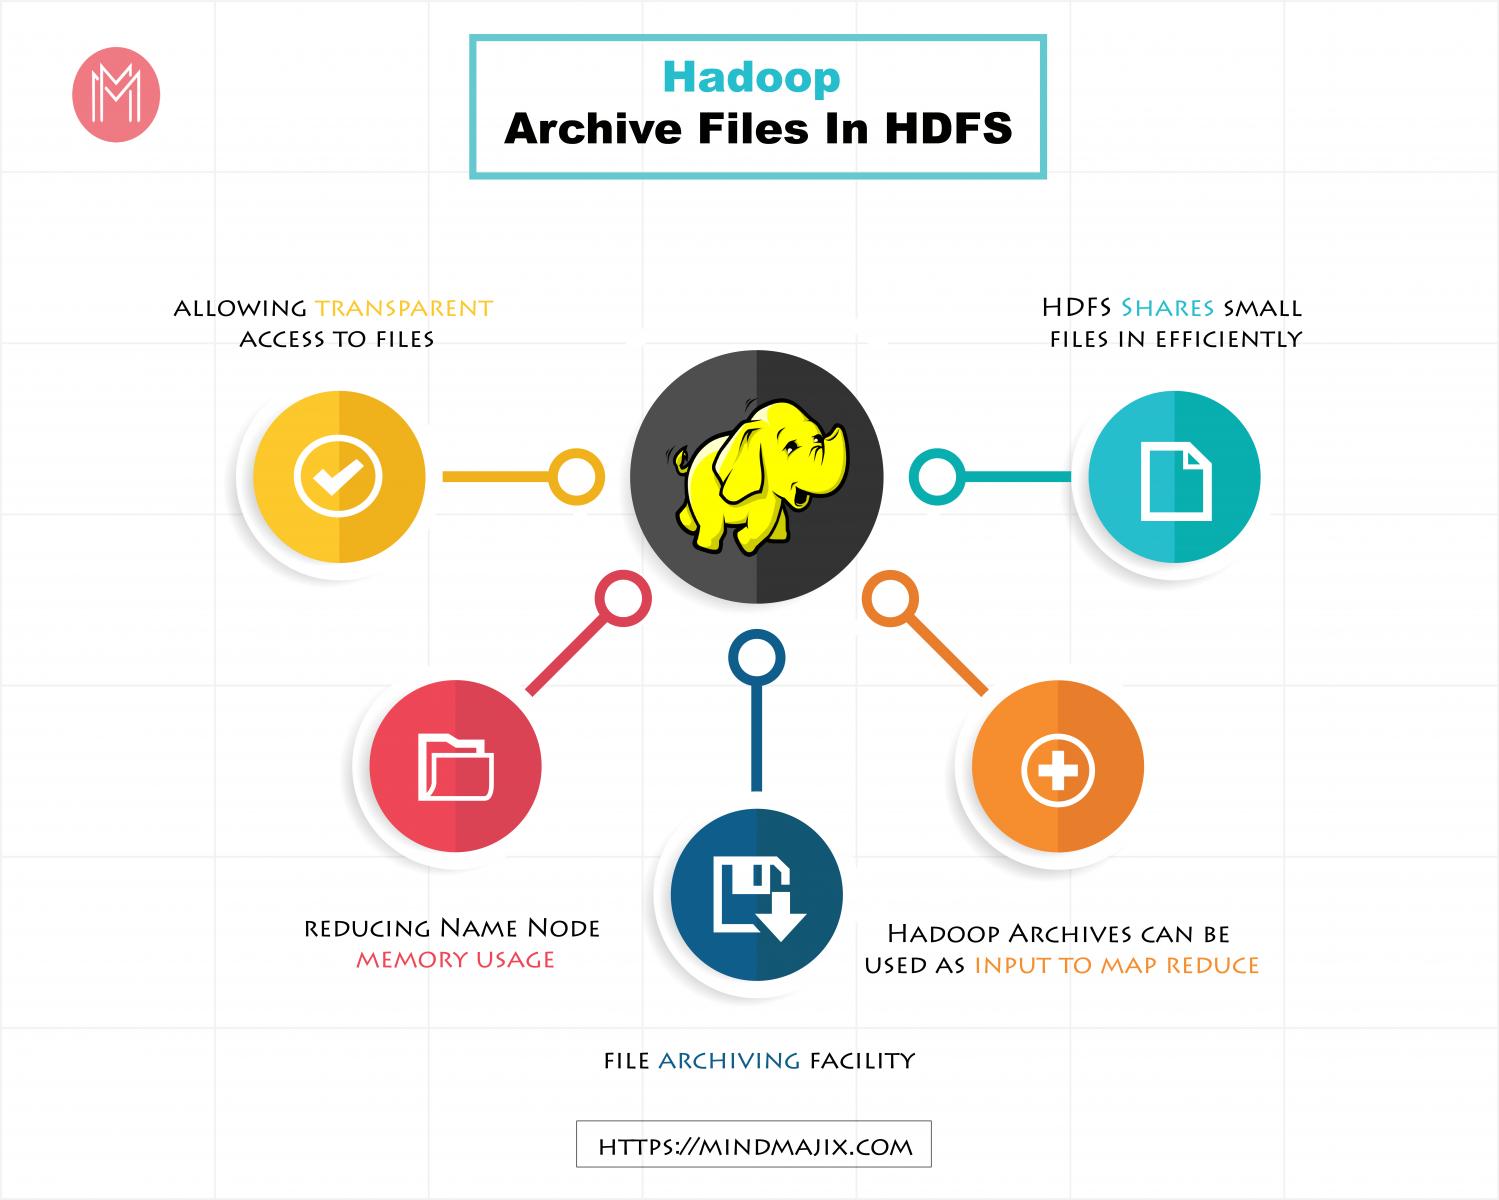 Hadoop Archive Files In HDFS